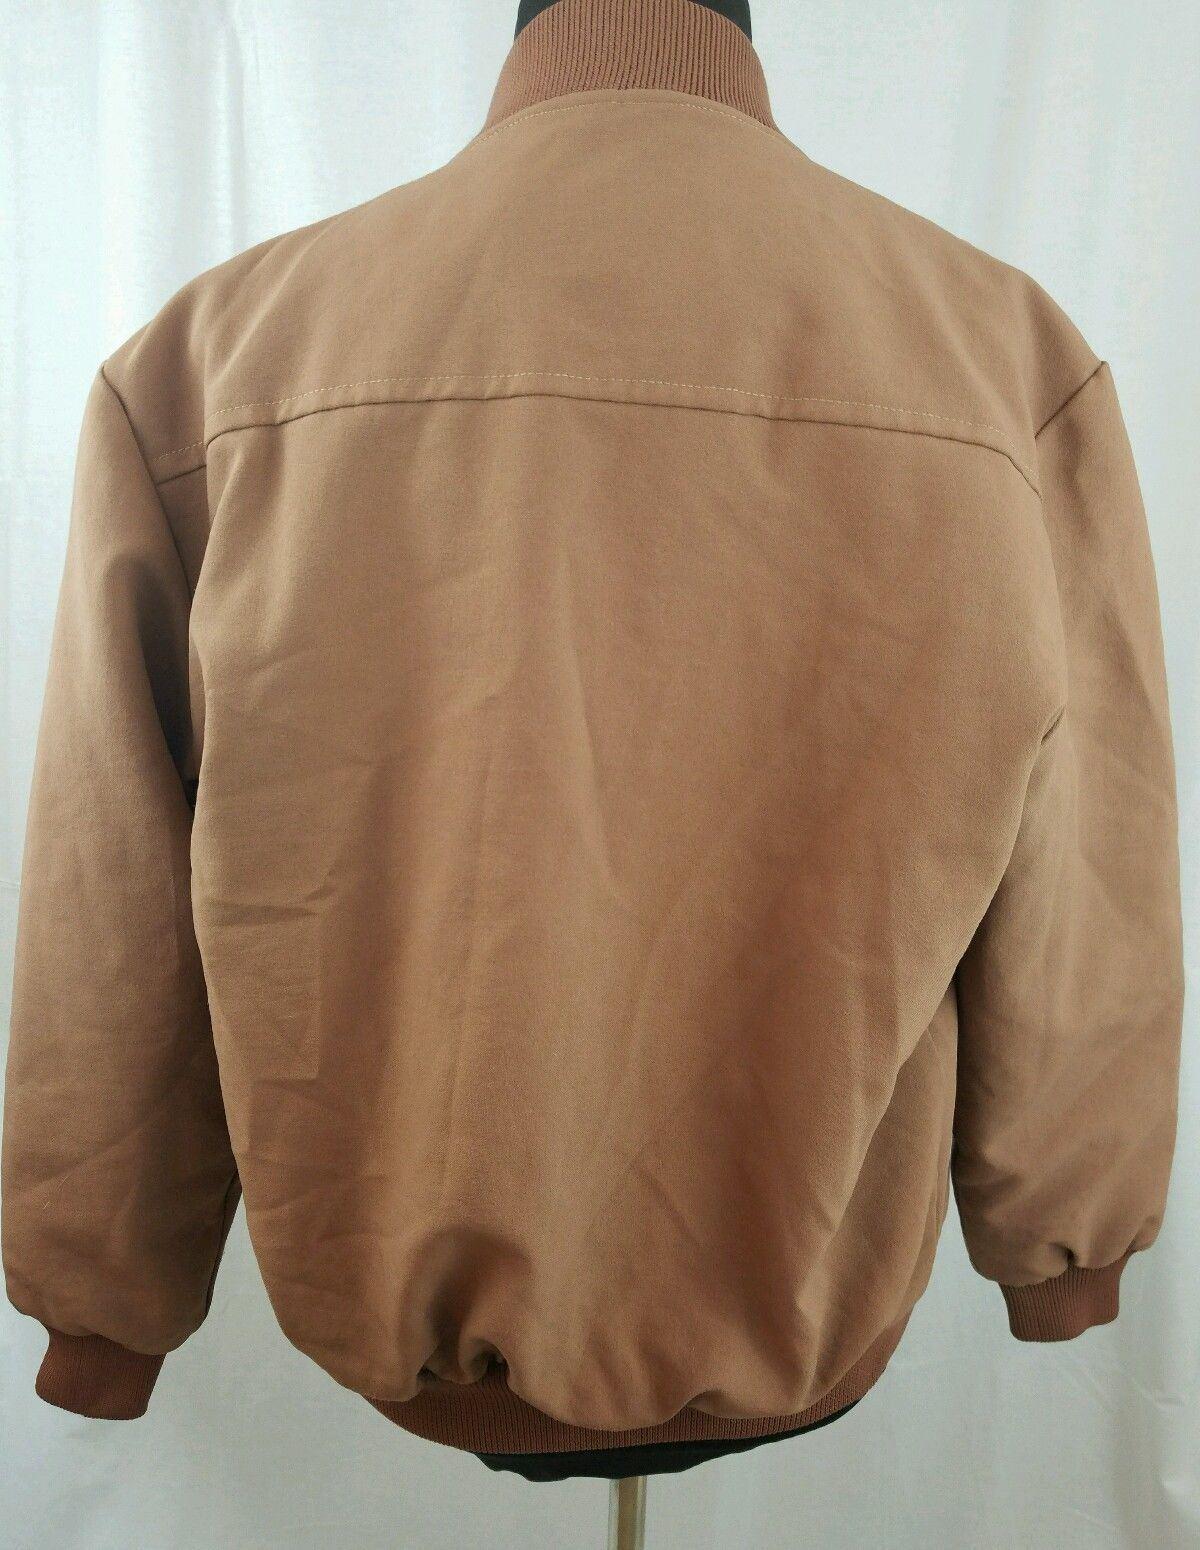 Big Ben Jacket Waterproof Brown Faux Fur Lining Pockets  Size Med